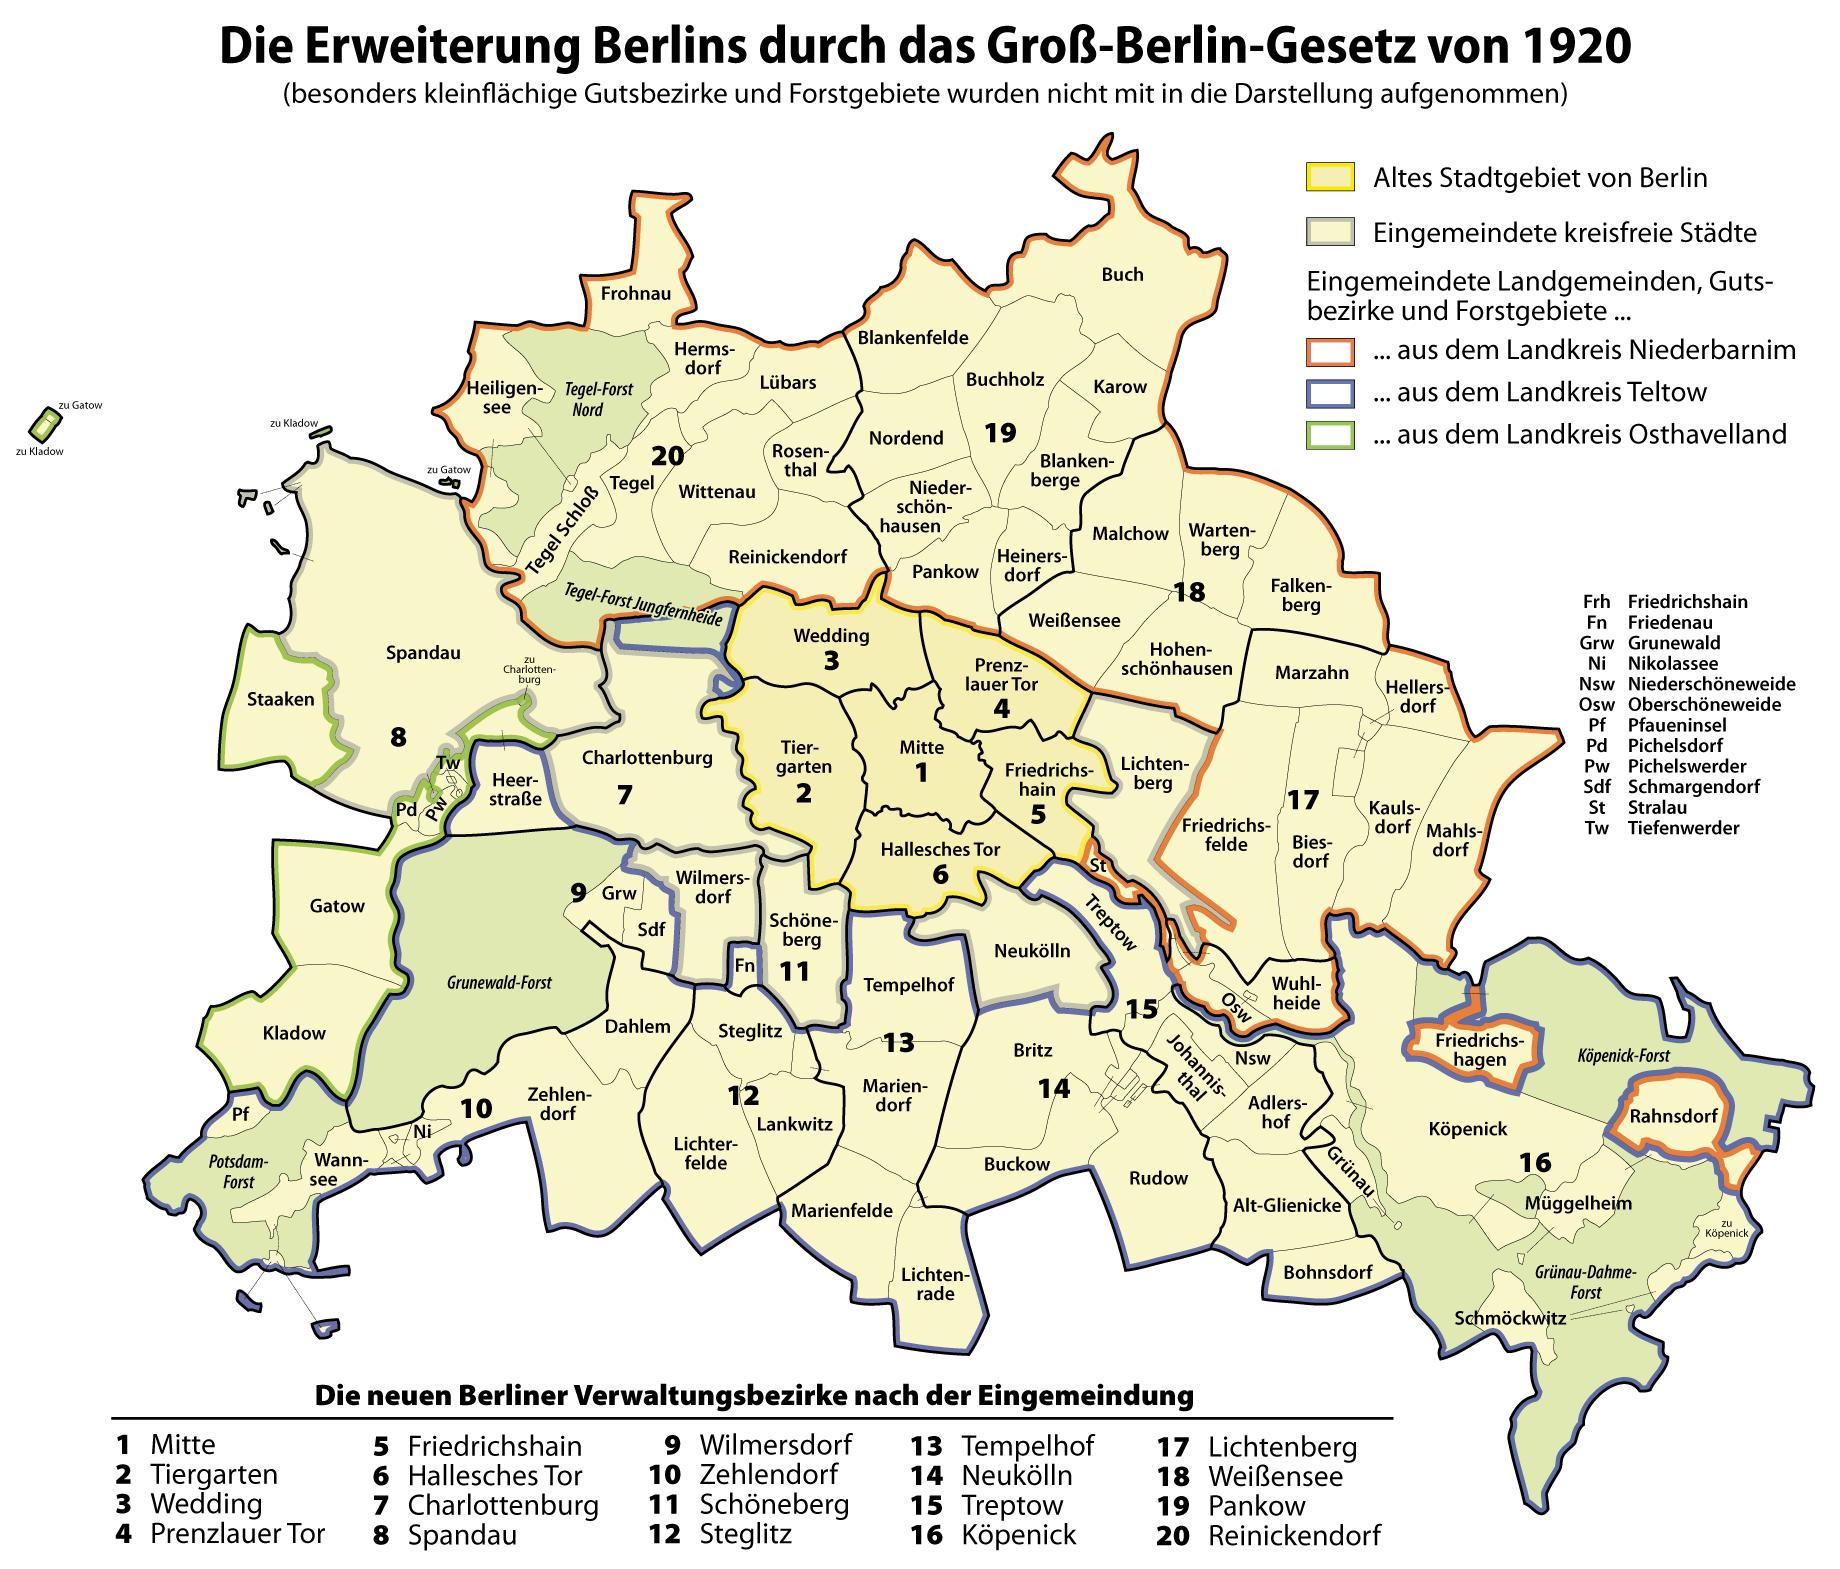 Territorios que se fusionaron en Berlín en 1920